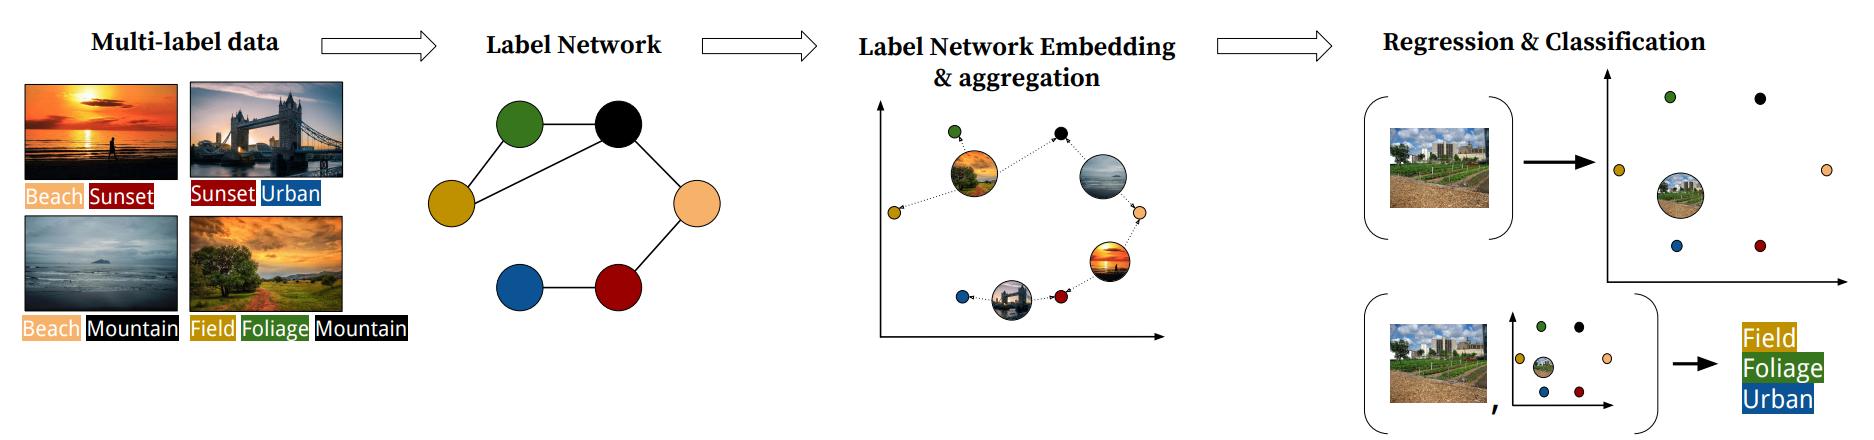 scikit-multilearn: Multi-Label Classification in Python